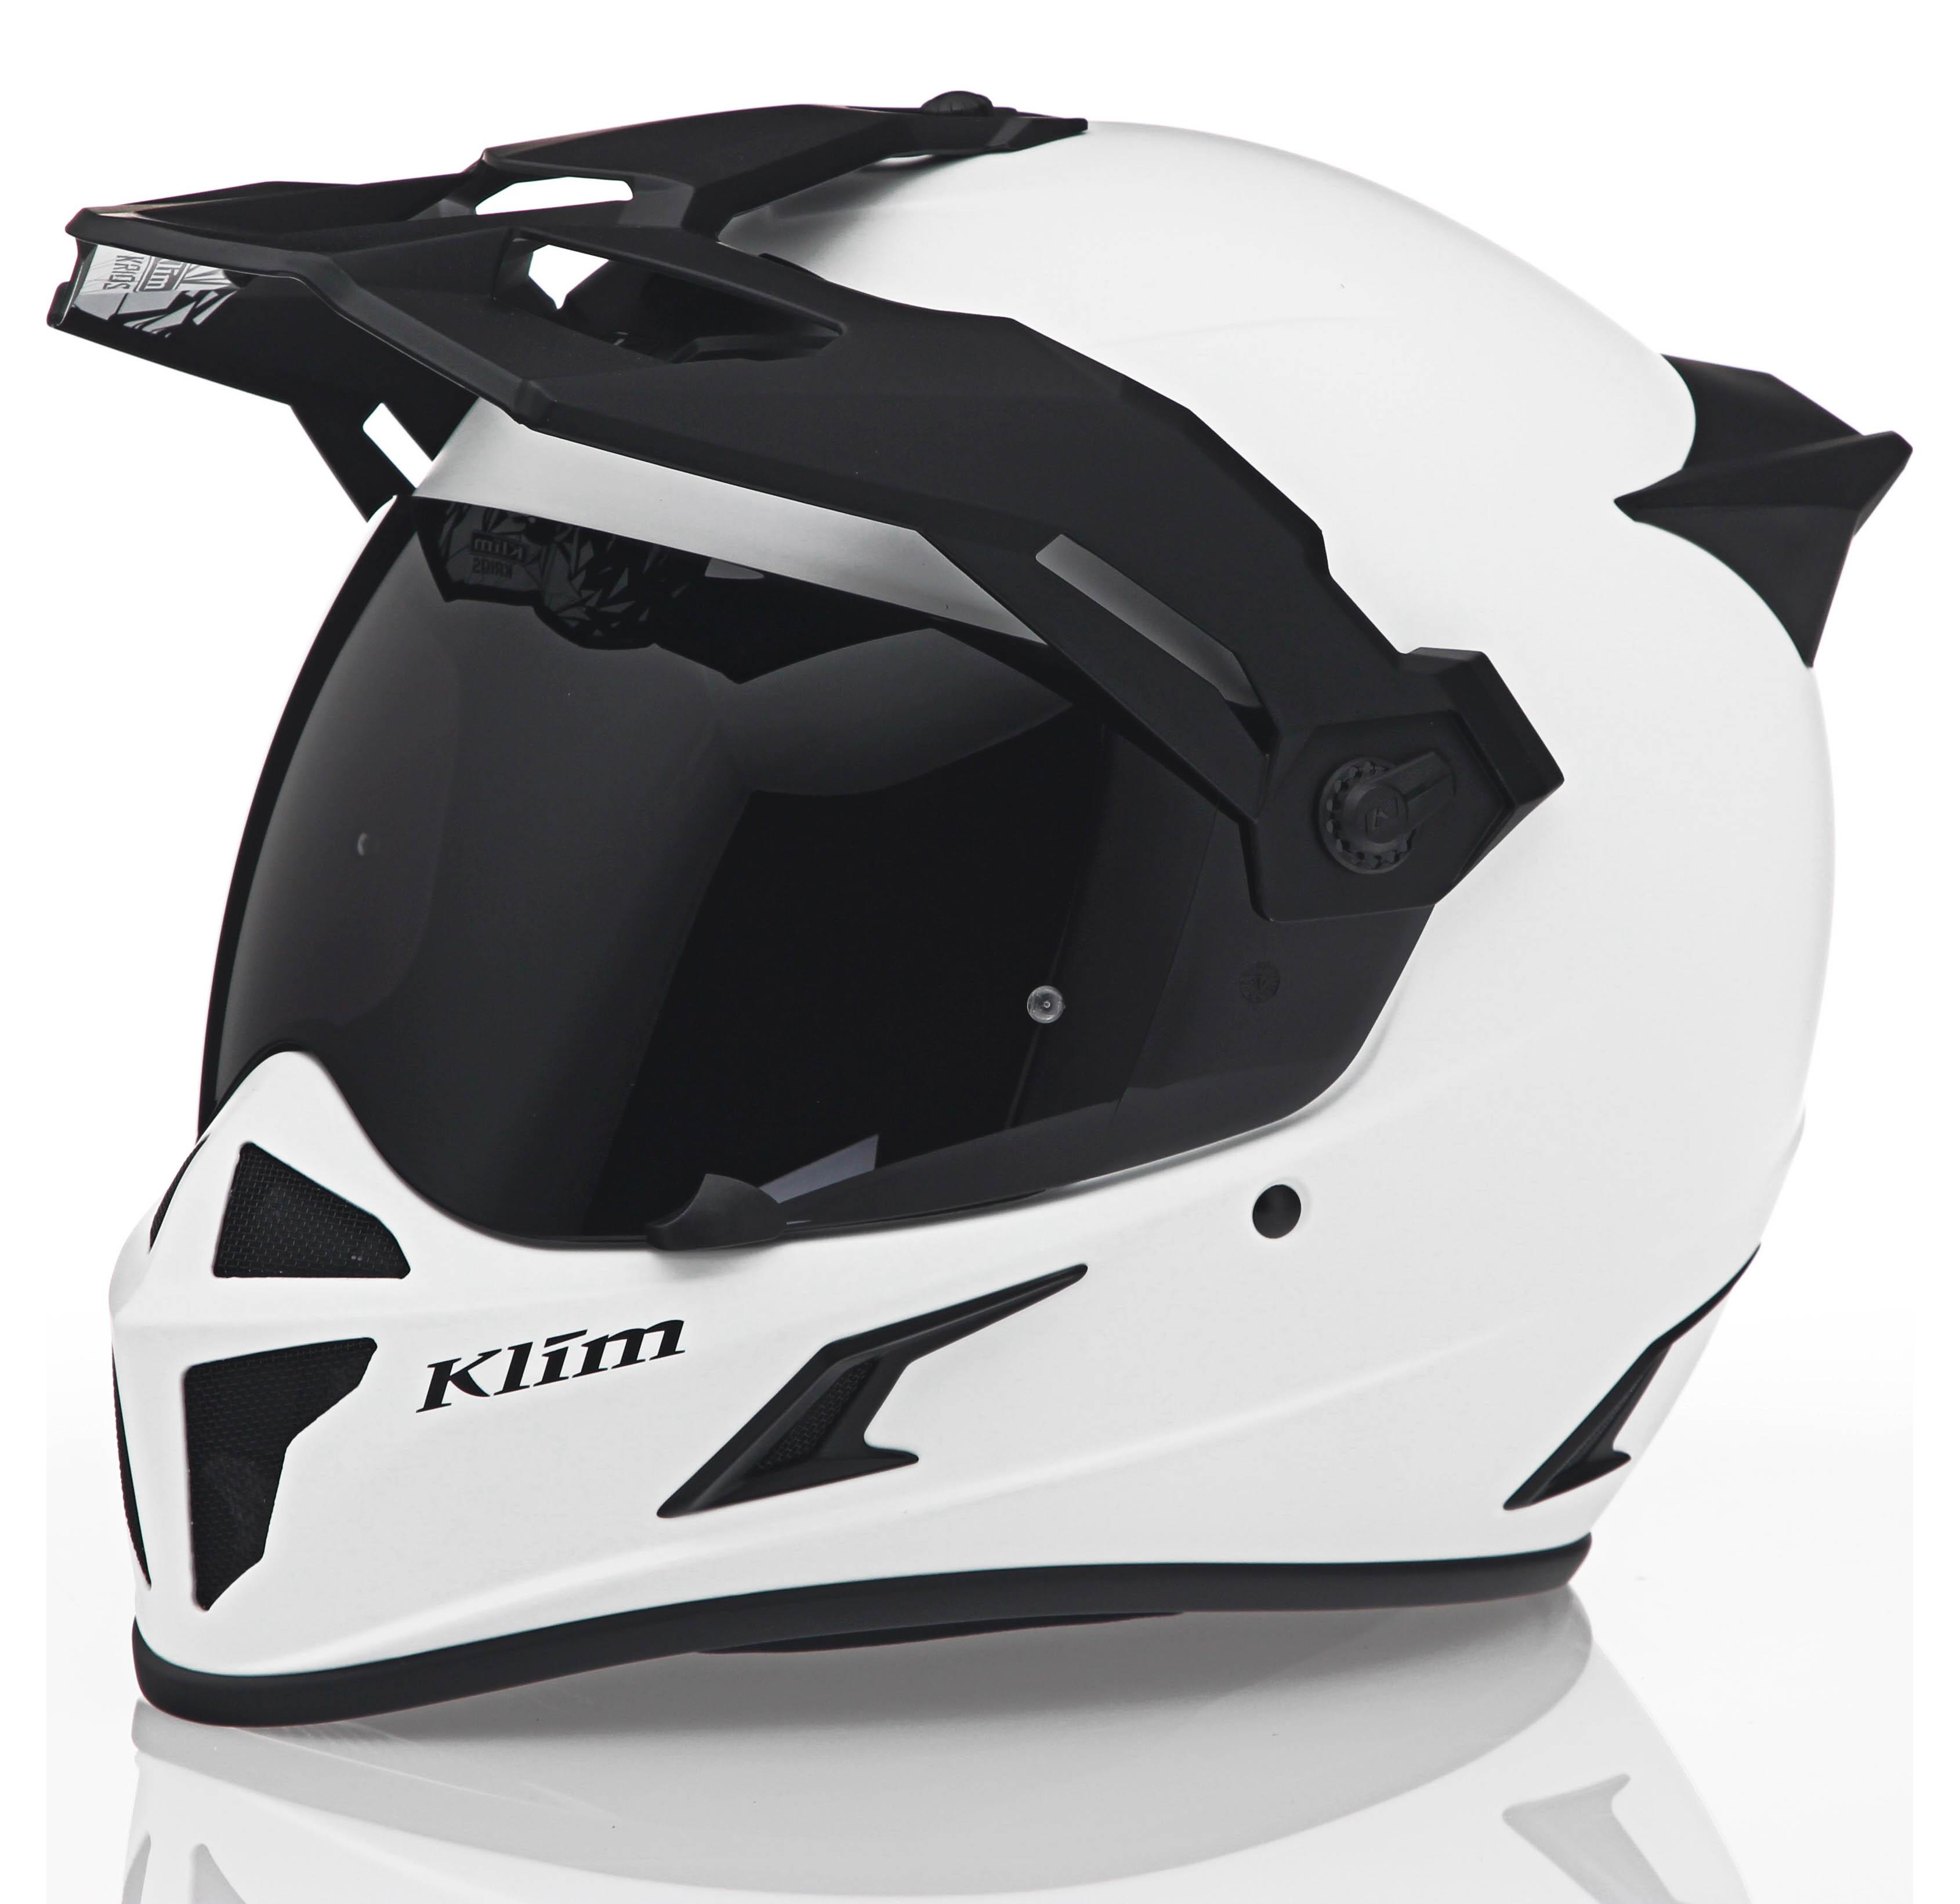 66fa0a223b97e Klim Krios Karbon Element Matte White Helmet